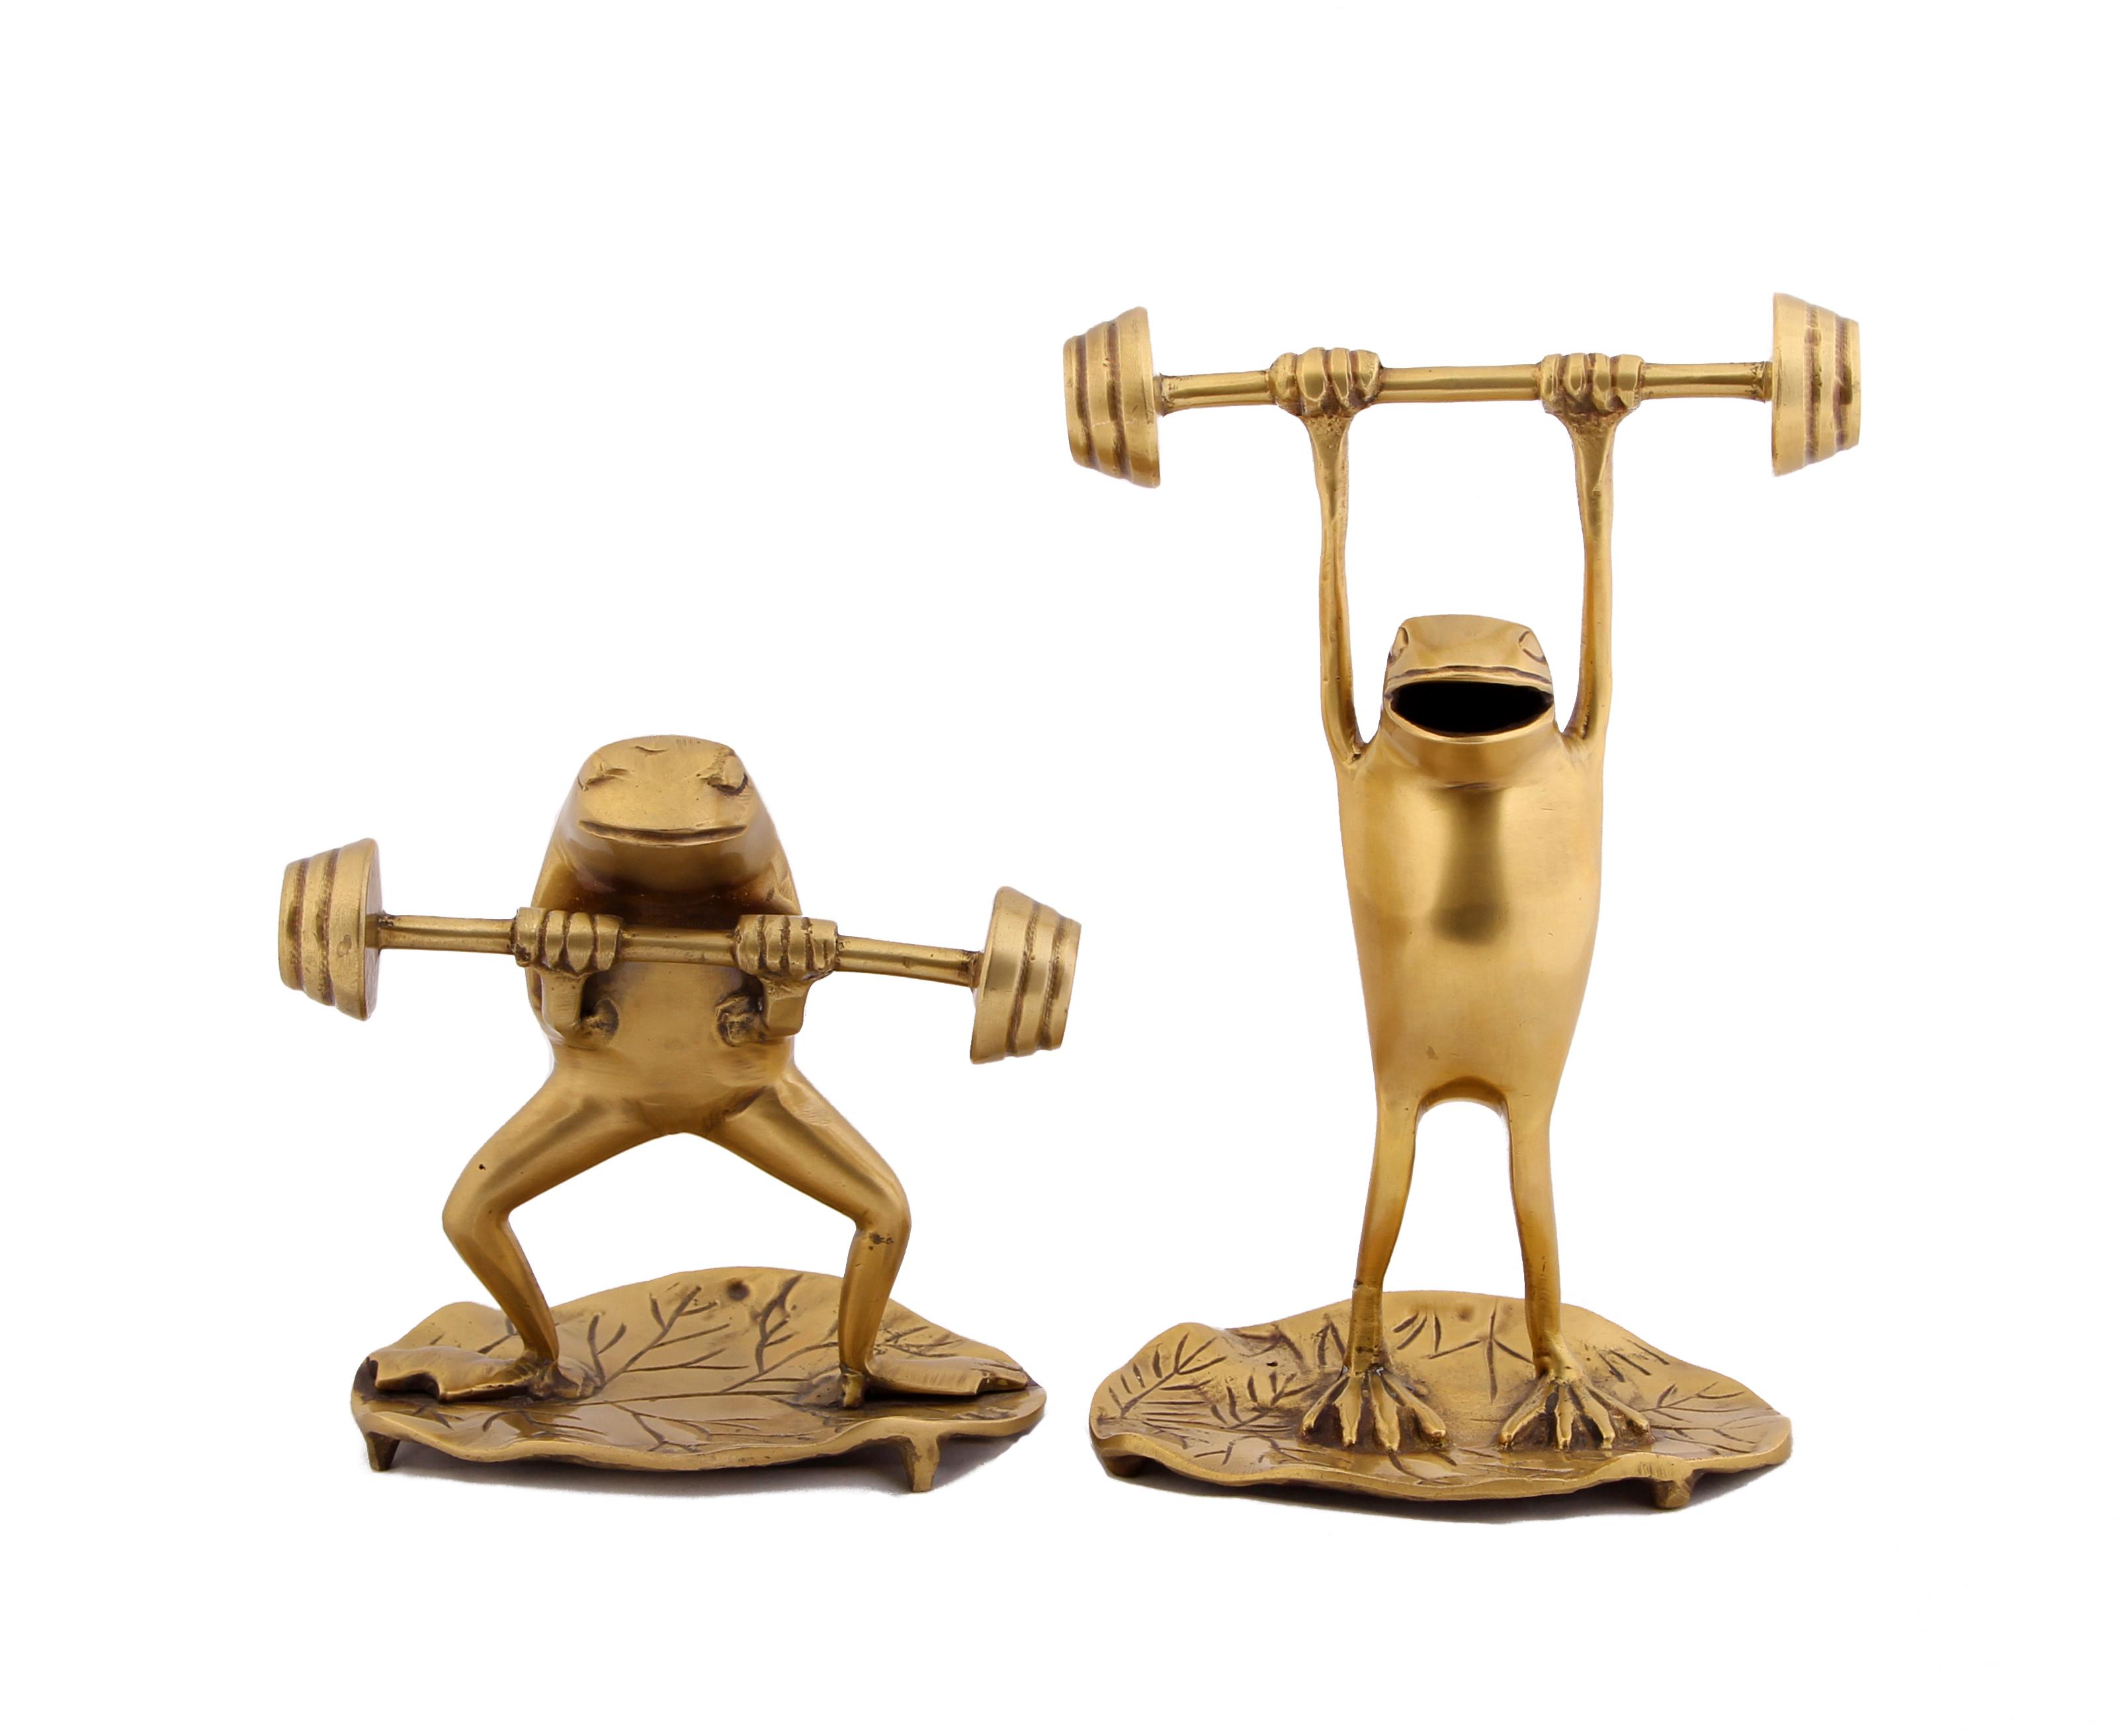 Статуэтки и фигурки Ганг Статуэтка Лягушки Атлеты (Набор) статуэтка moda argenti статуэтка st378a